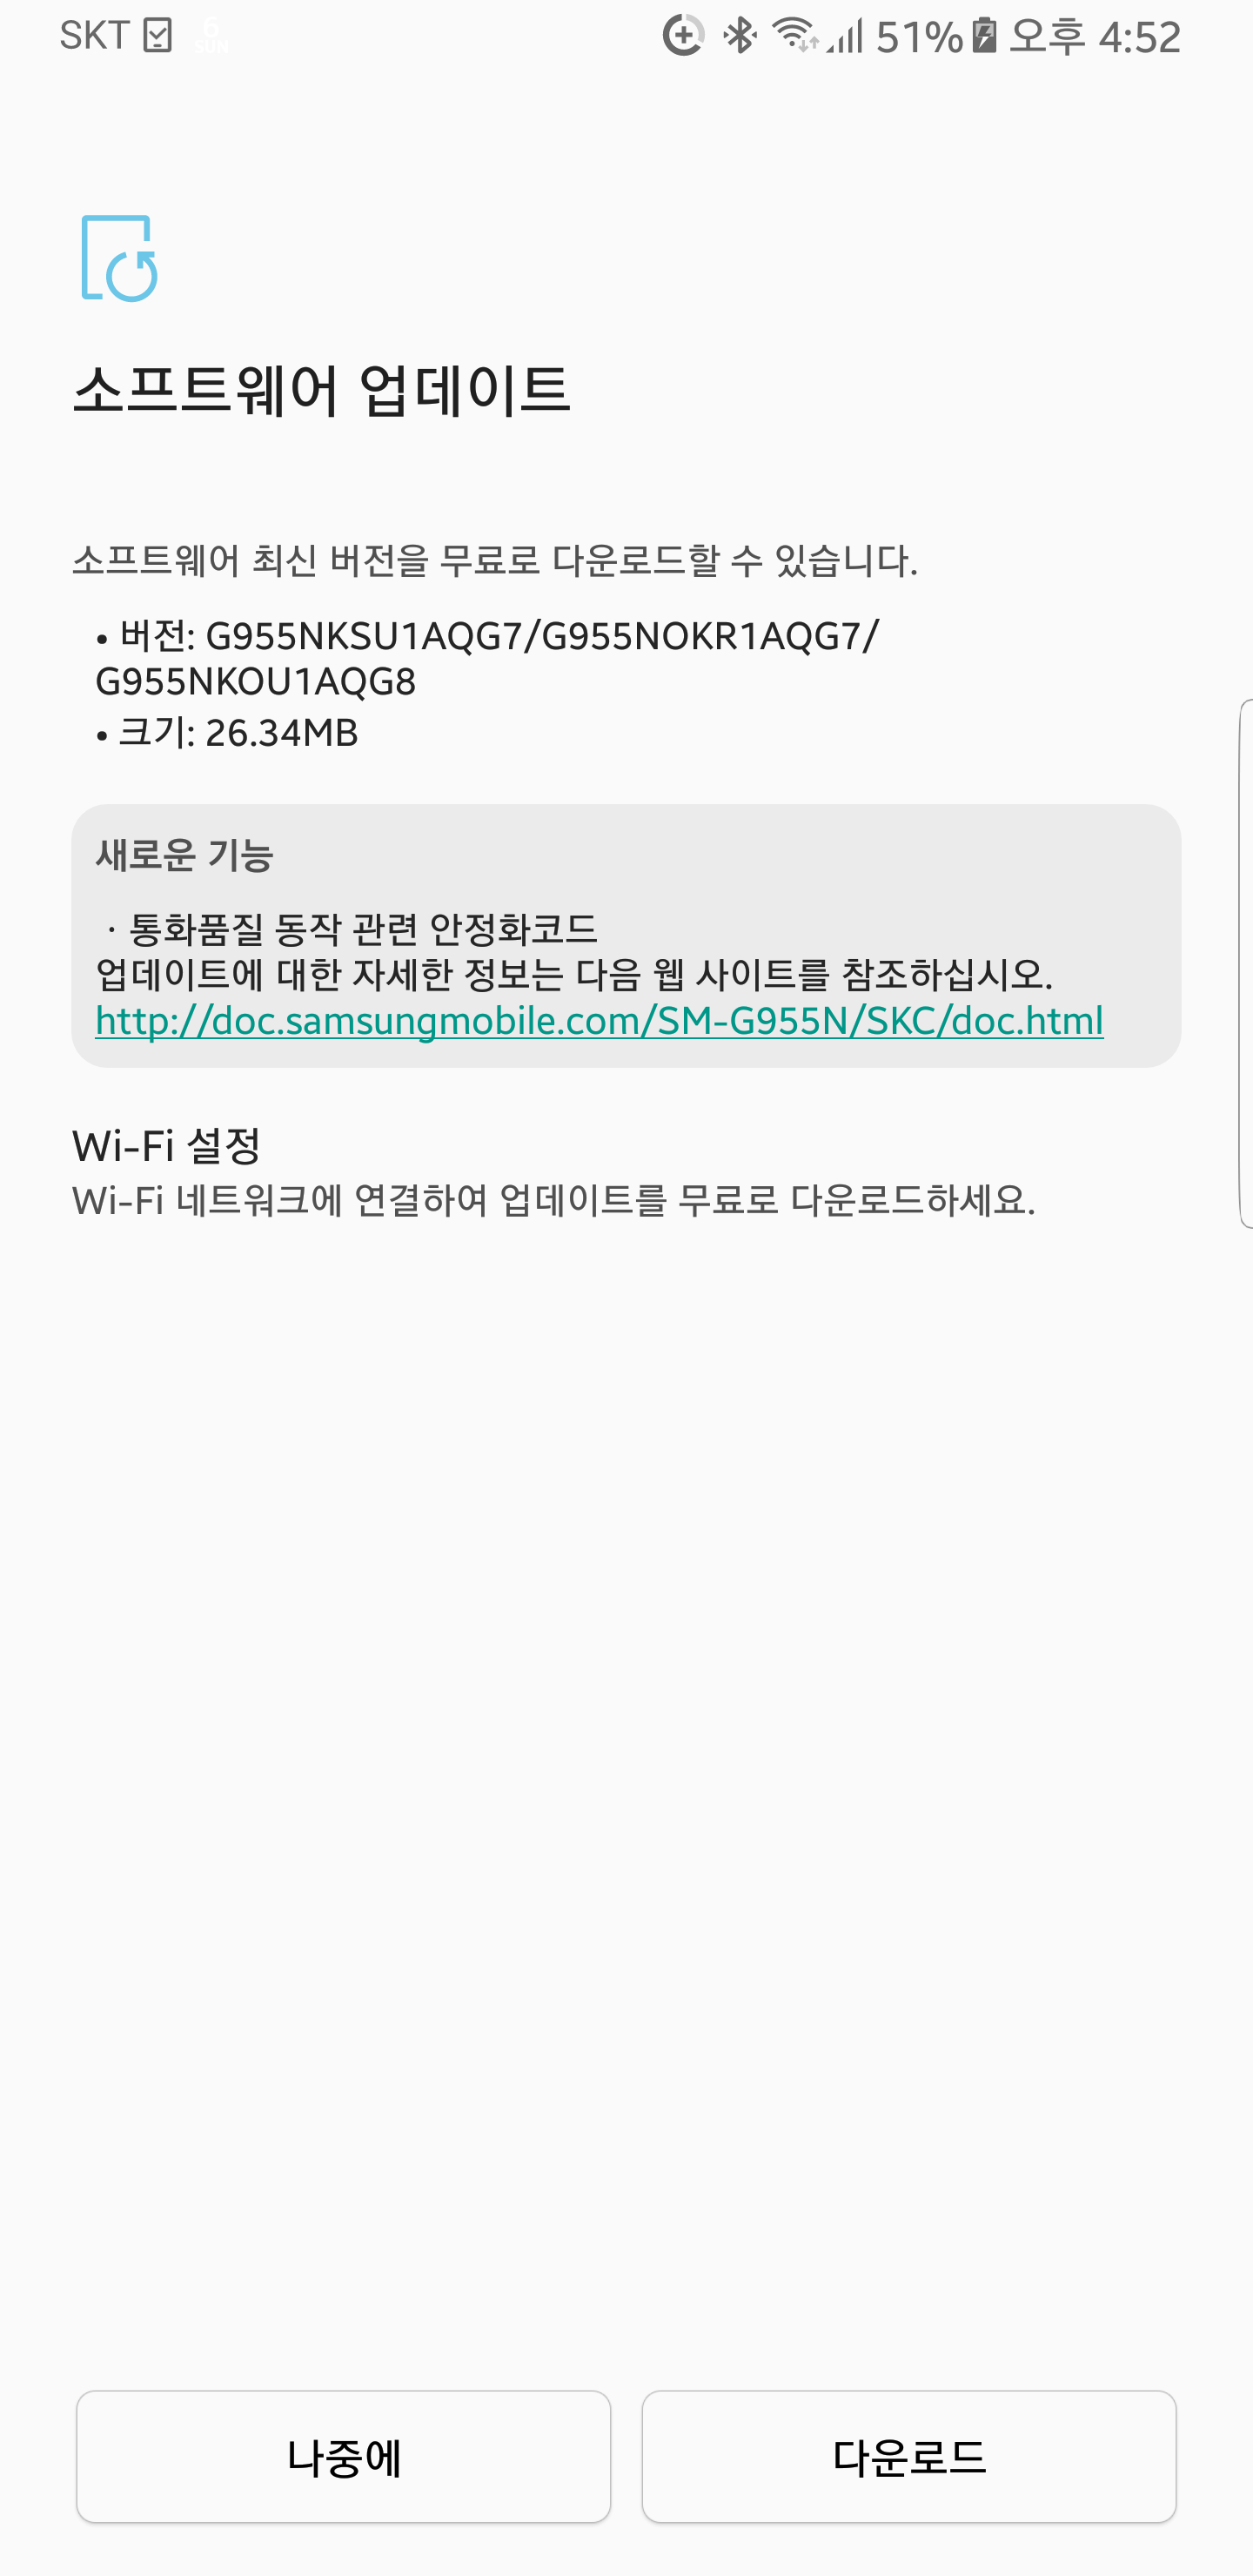 Screenshot_20170806-165259.png